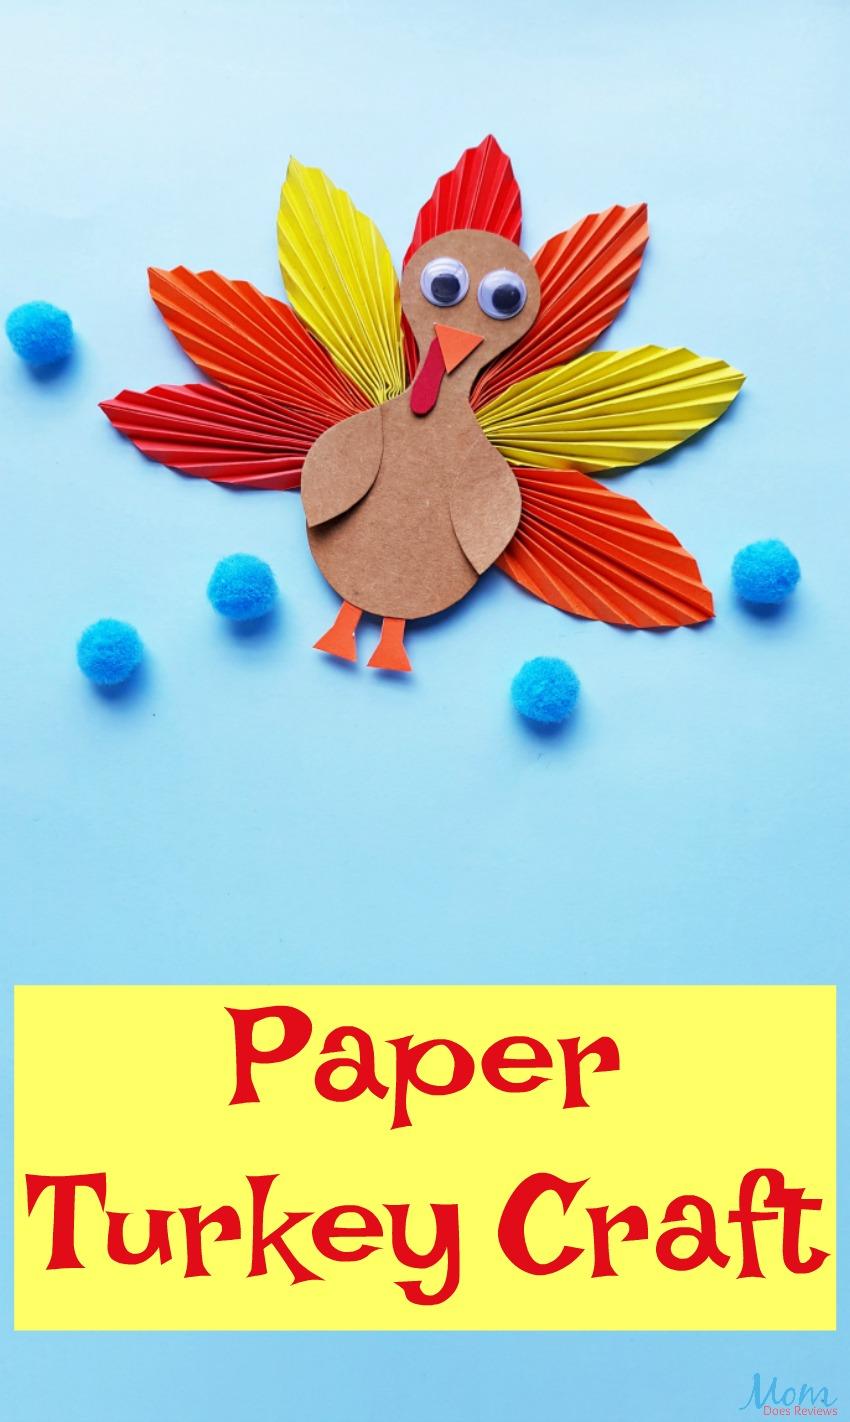 Fun Paper Turkey Craft for the Kids this Thanksgiving! #craft #turkey #funstuff